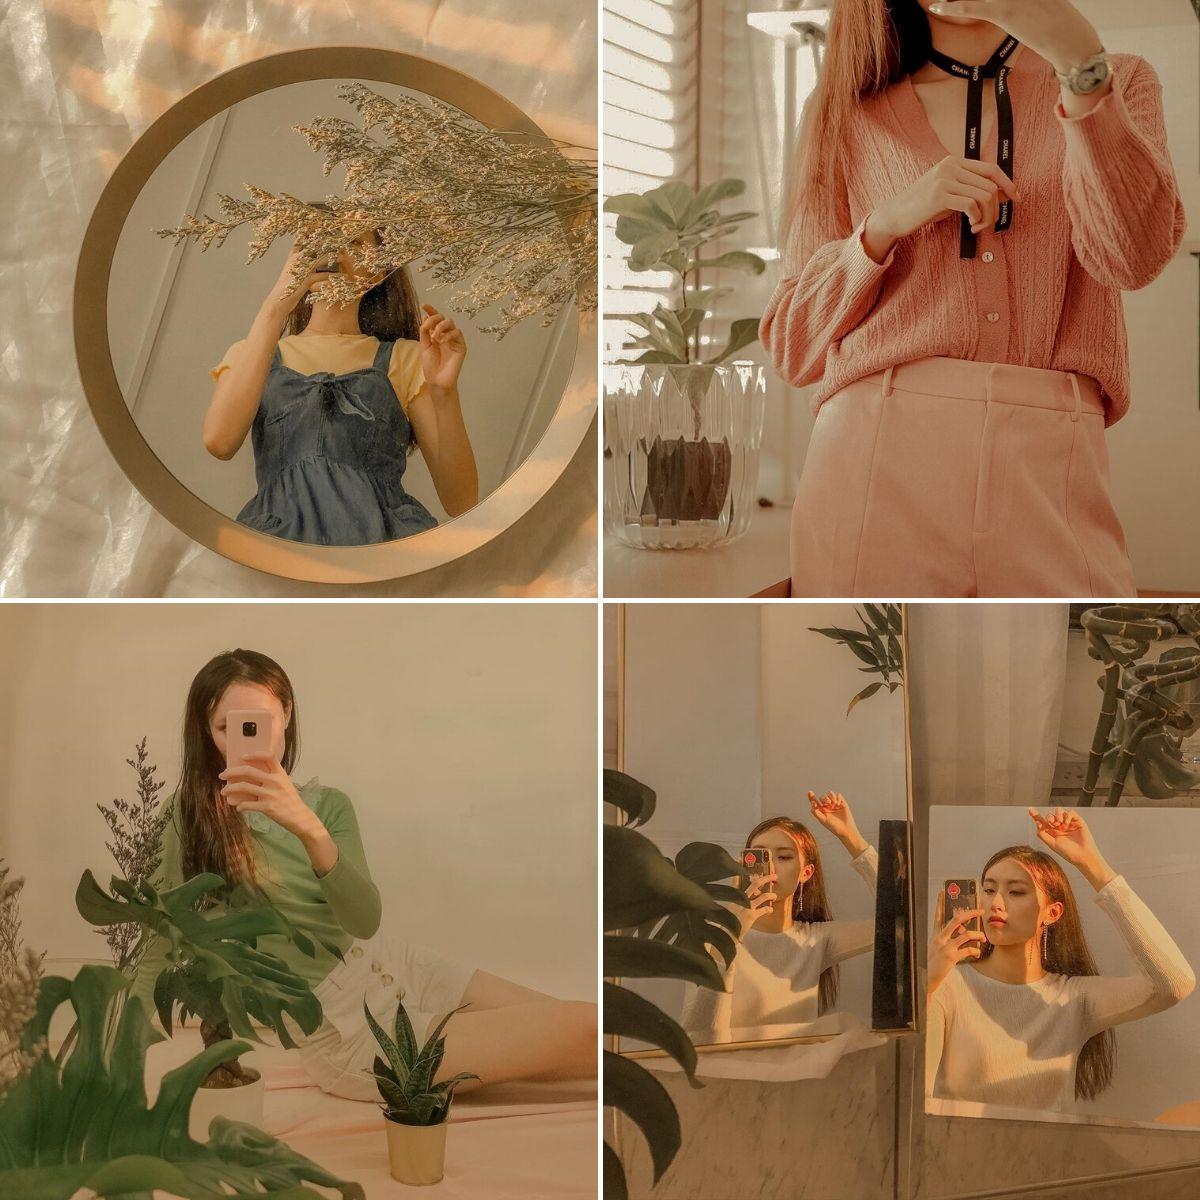 instagram phong cách artsy aesthetic nghệ thuật annmarieyang